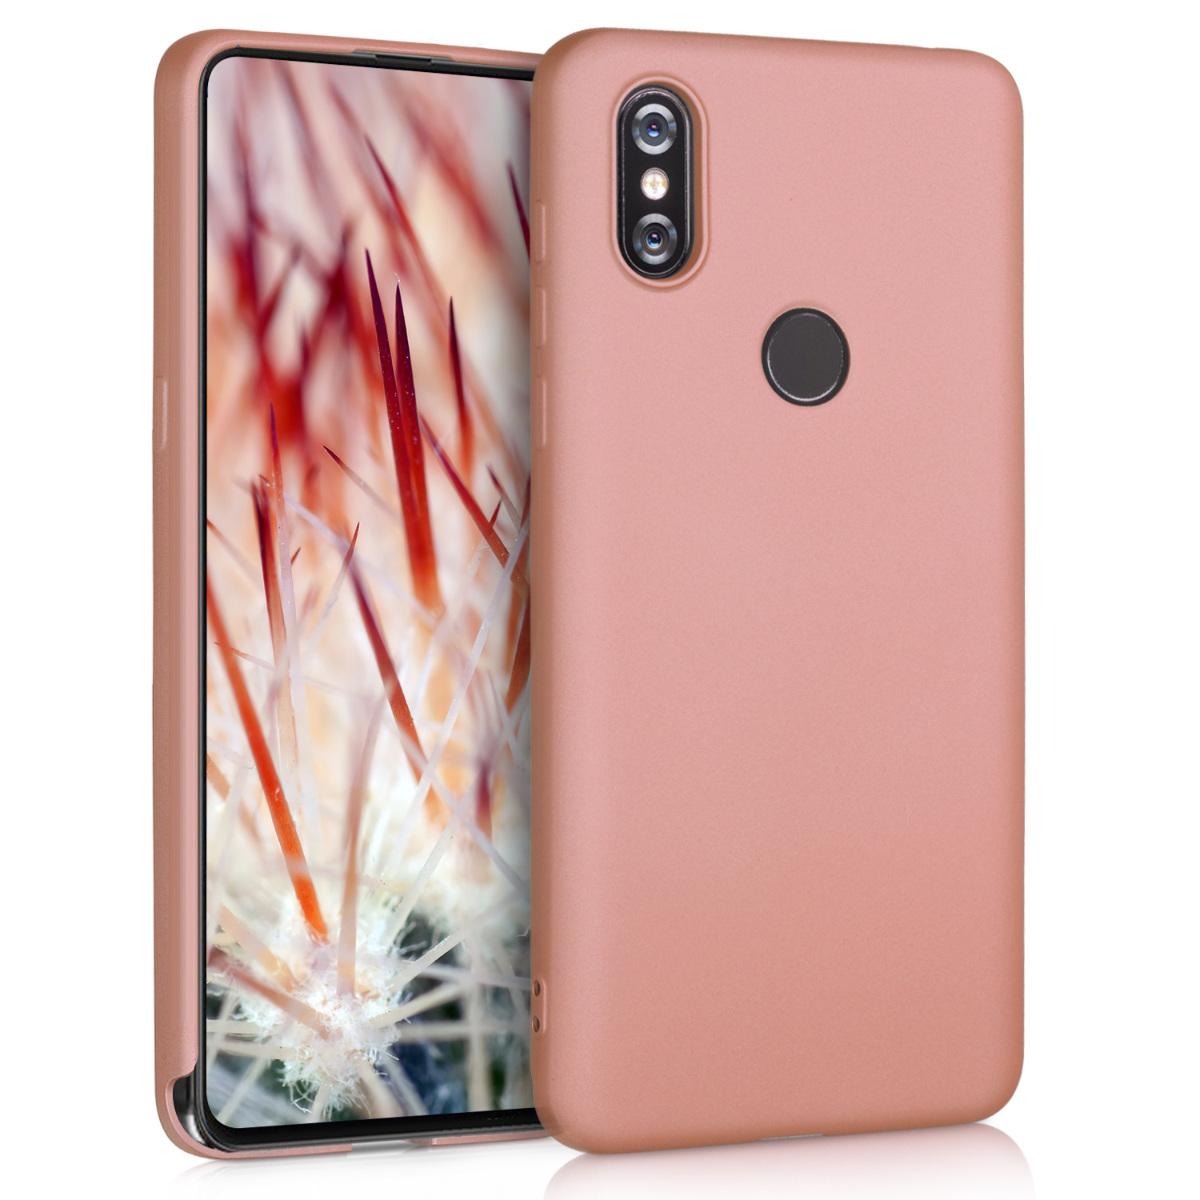 KW Θήκη Σιλικόνης Xiaomi Mi Mix 3 - Μεταλλικό ροζ/χάλκινο (47223.31)